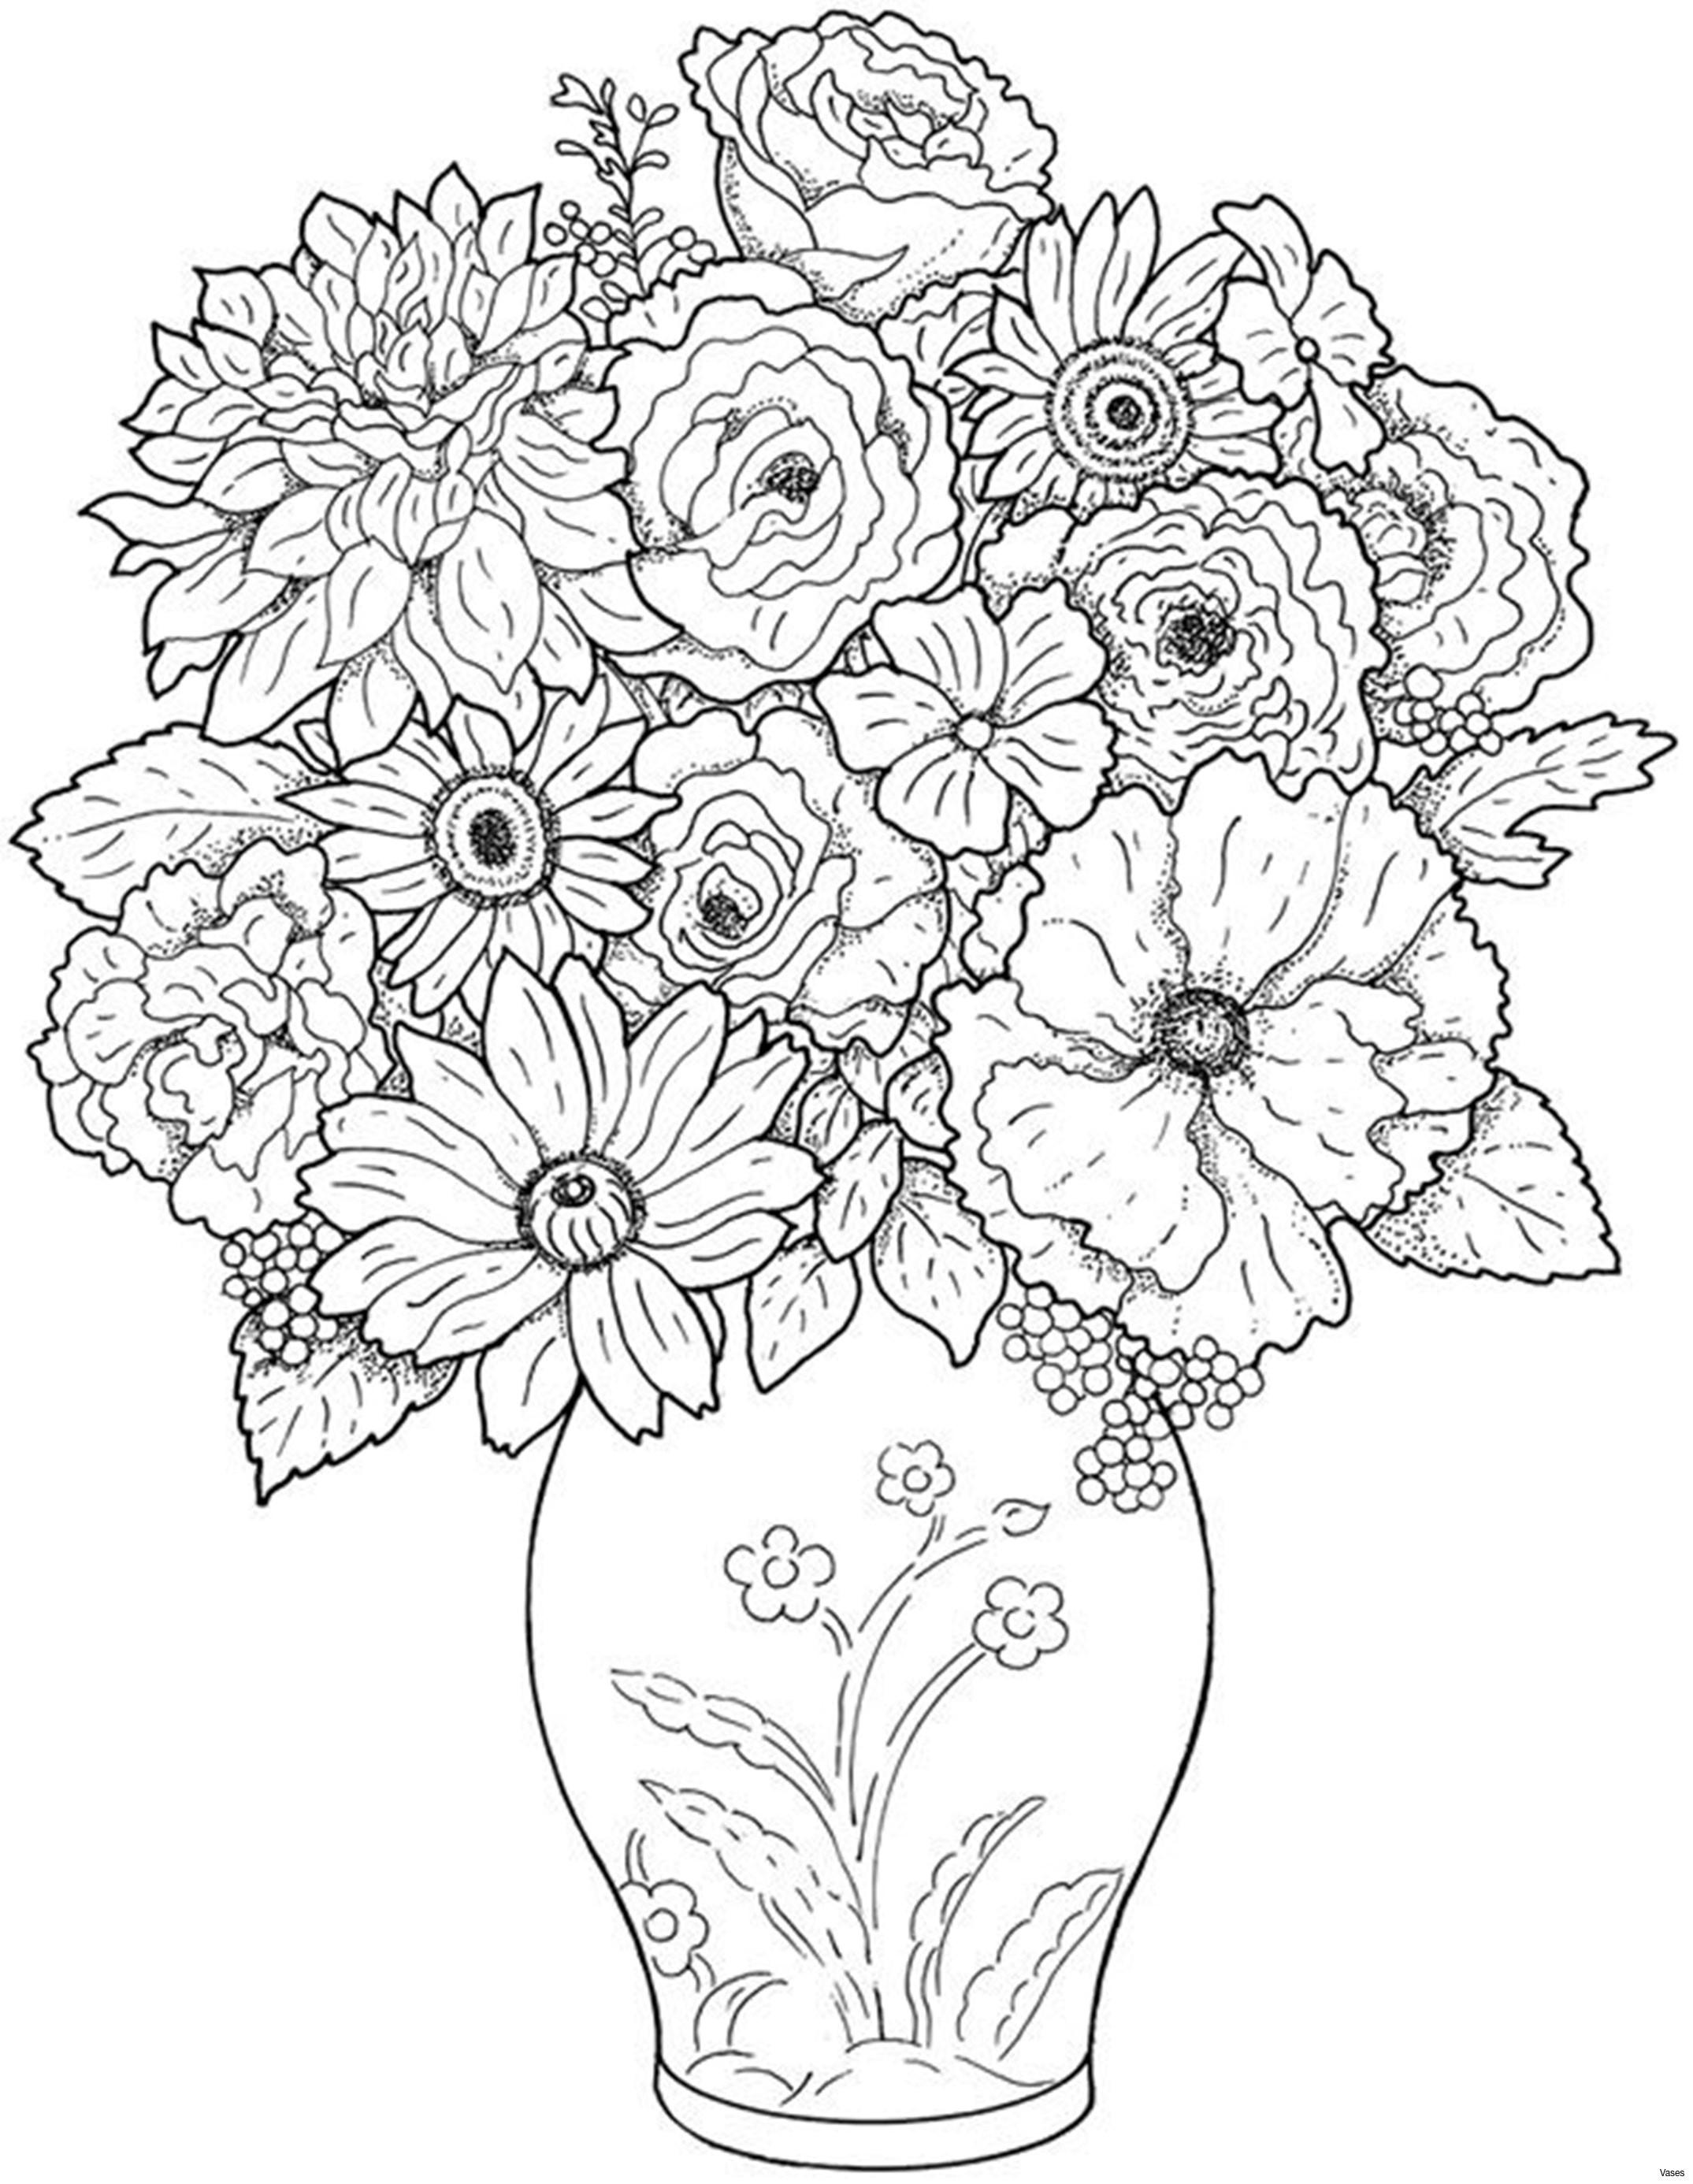 royal blue vase fillers of 27 beautiful flower vase definition flower decoration ideas in flower vase definition fresh flowers in vase coloring pages